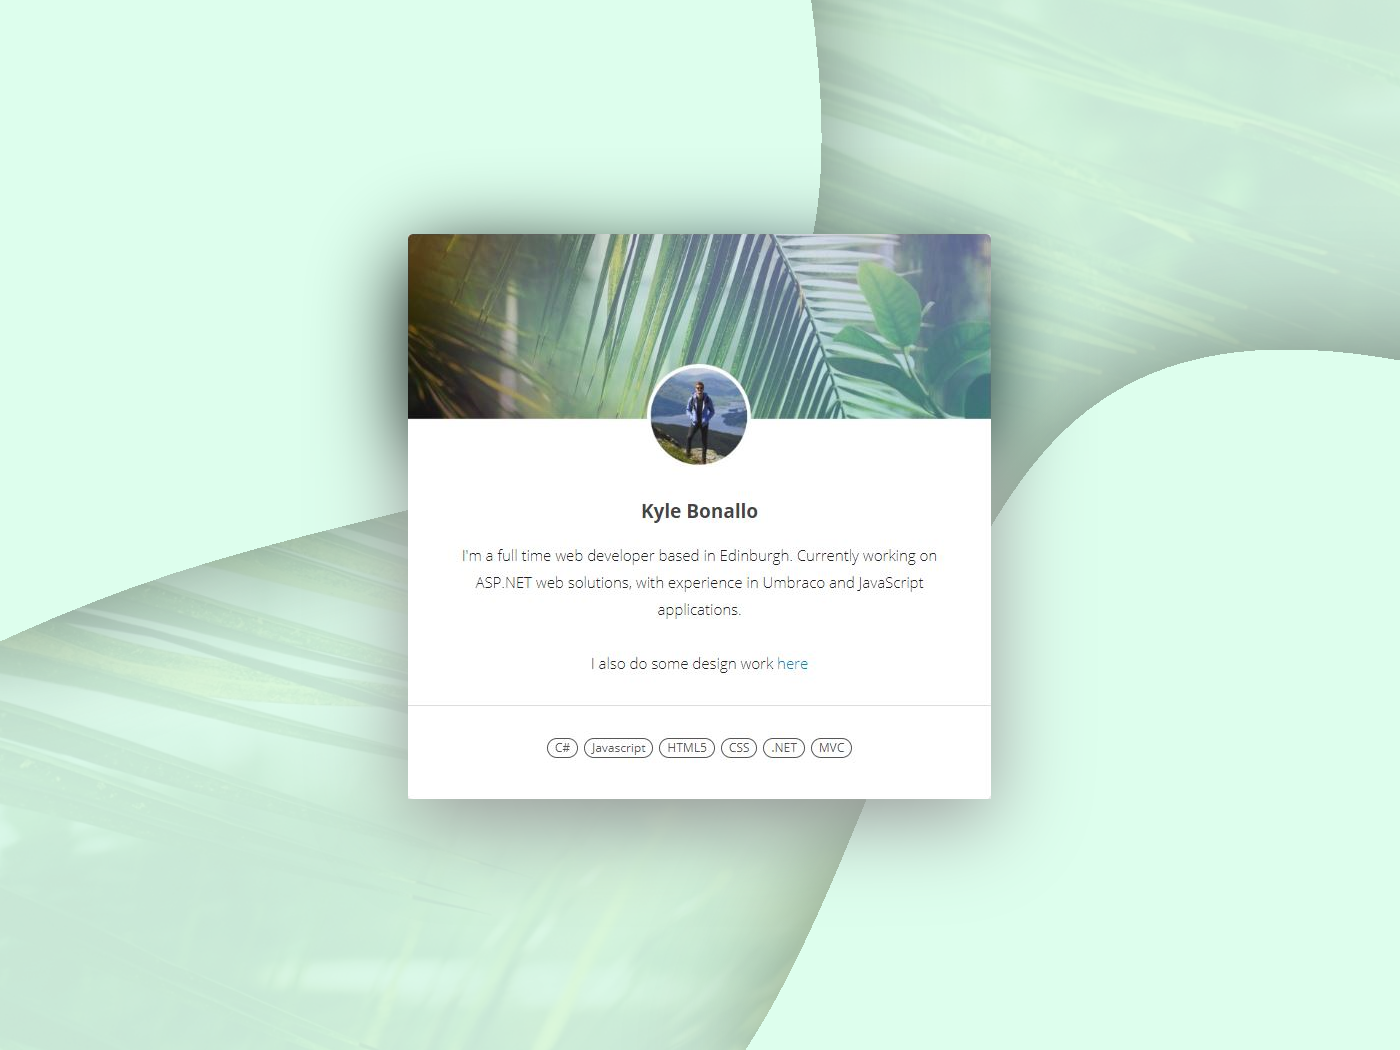 Profile Card scotland mint green user illustration gradient circle graphic design edinburgh profile card profile